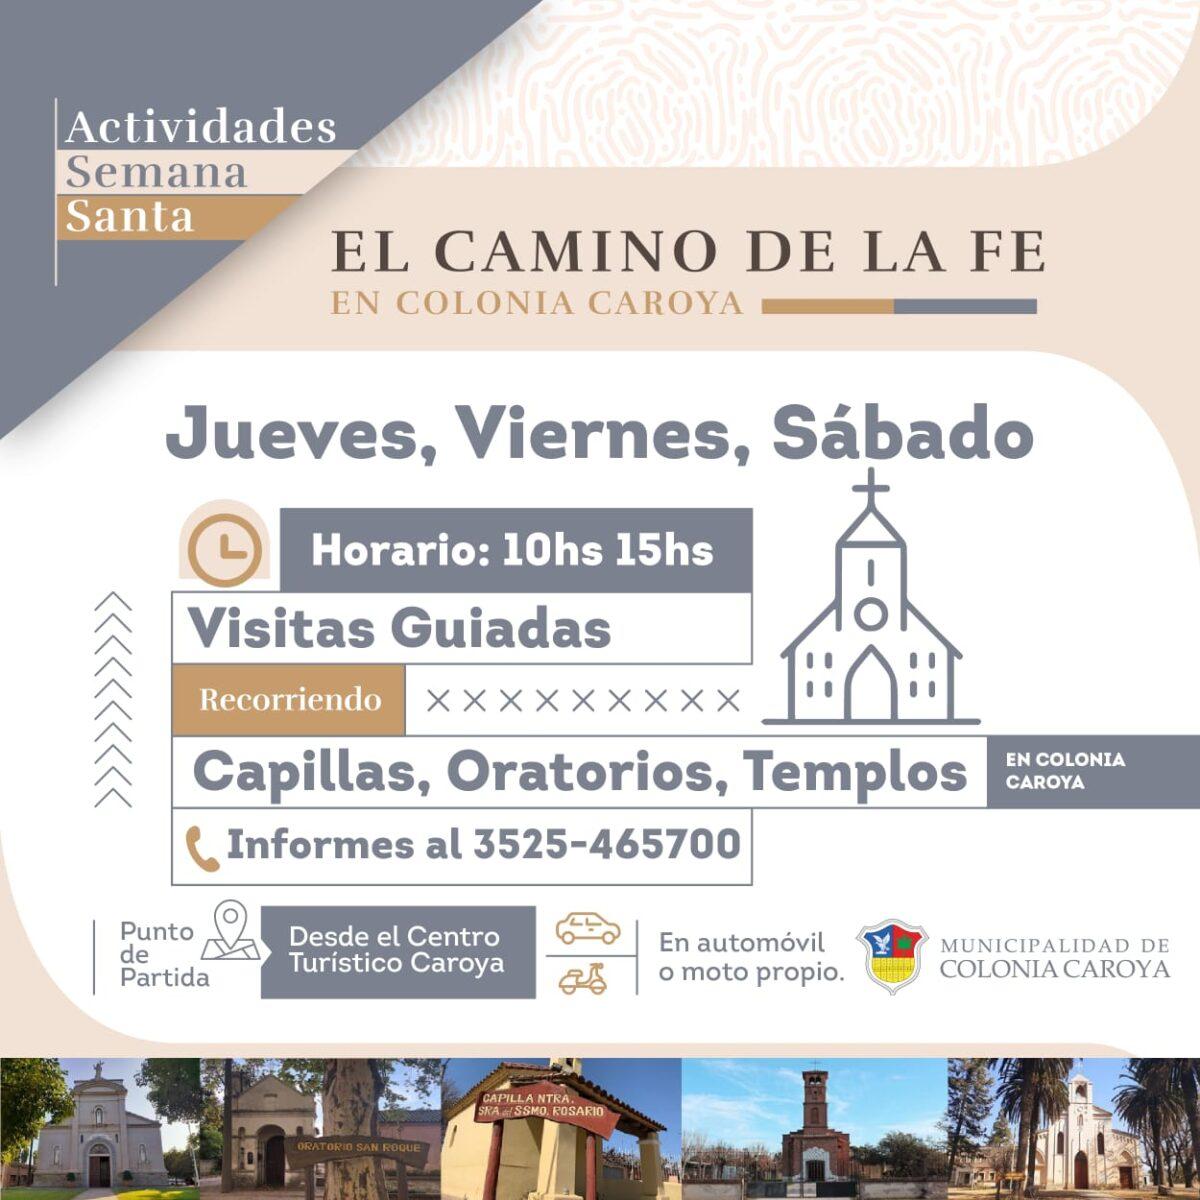 Colonia Caroya: Agenda de actividades para Semana Santa 2021